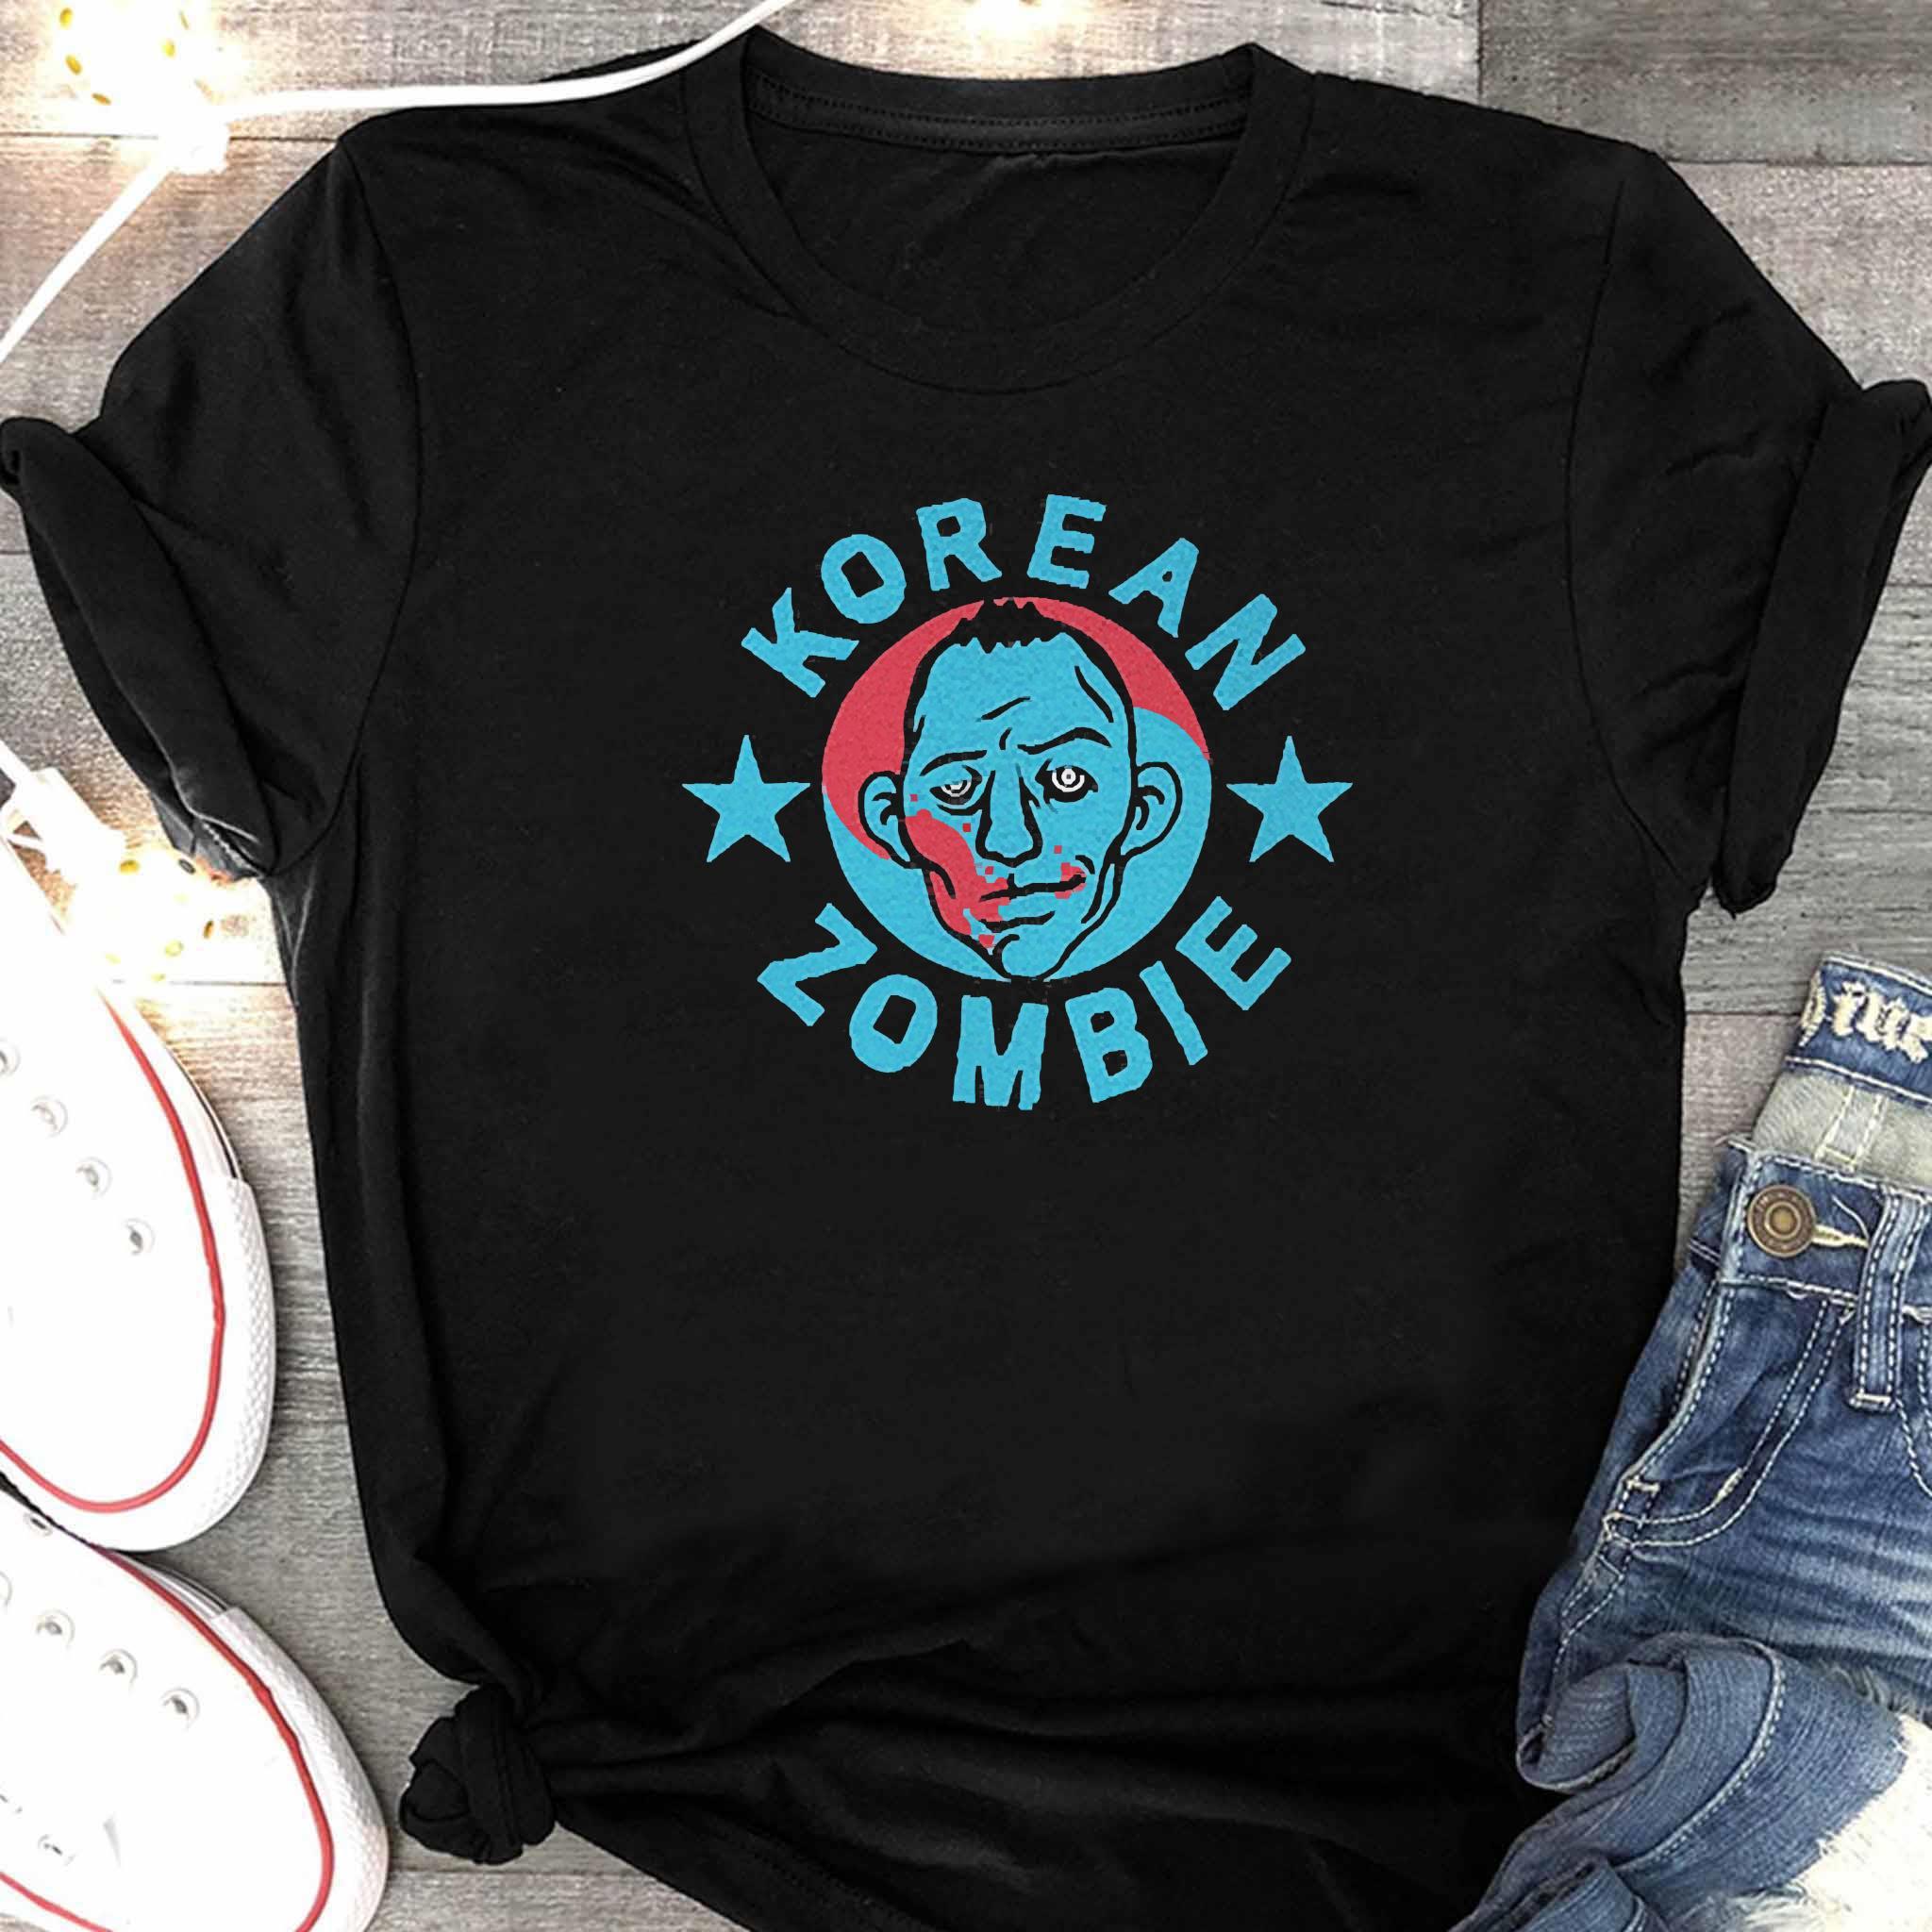 Korean Zombie 2020 Shirt Women's Shirt